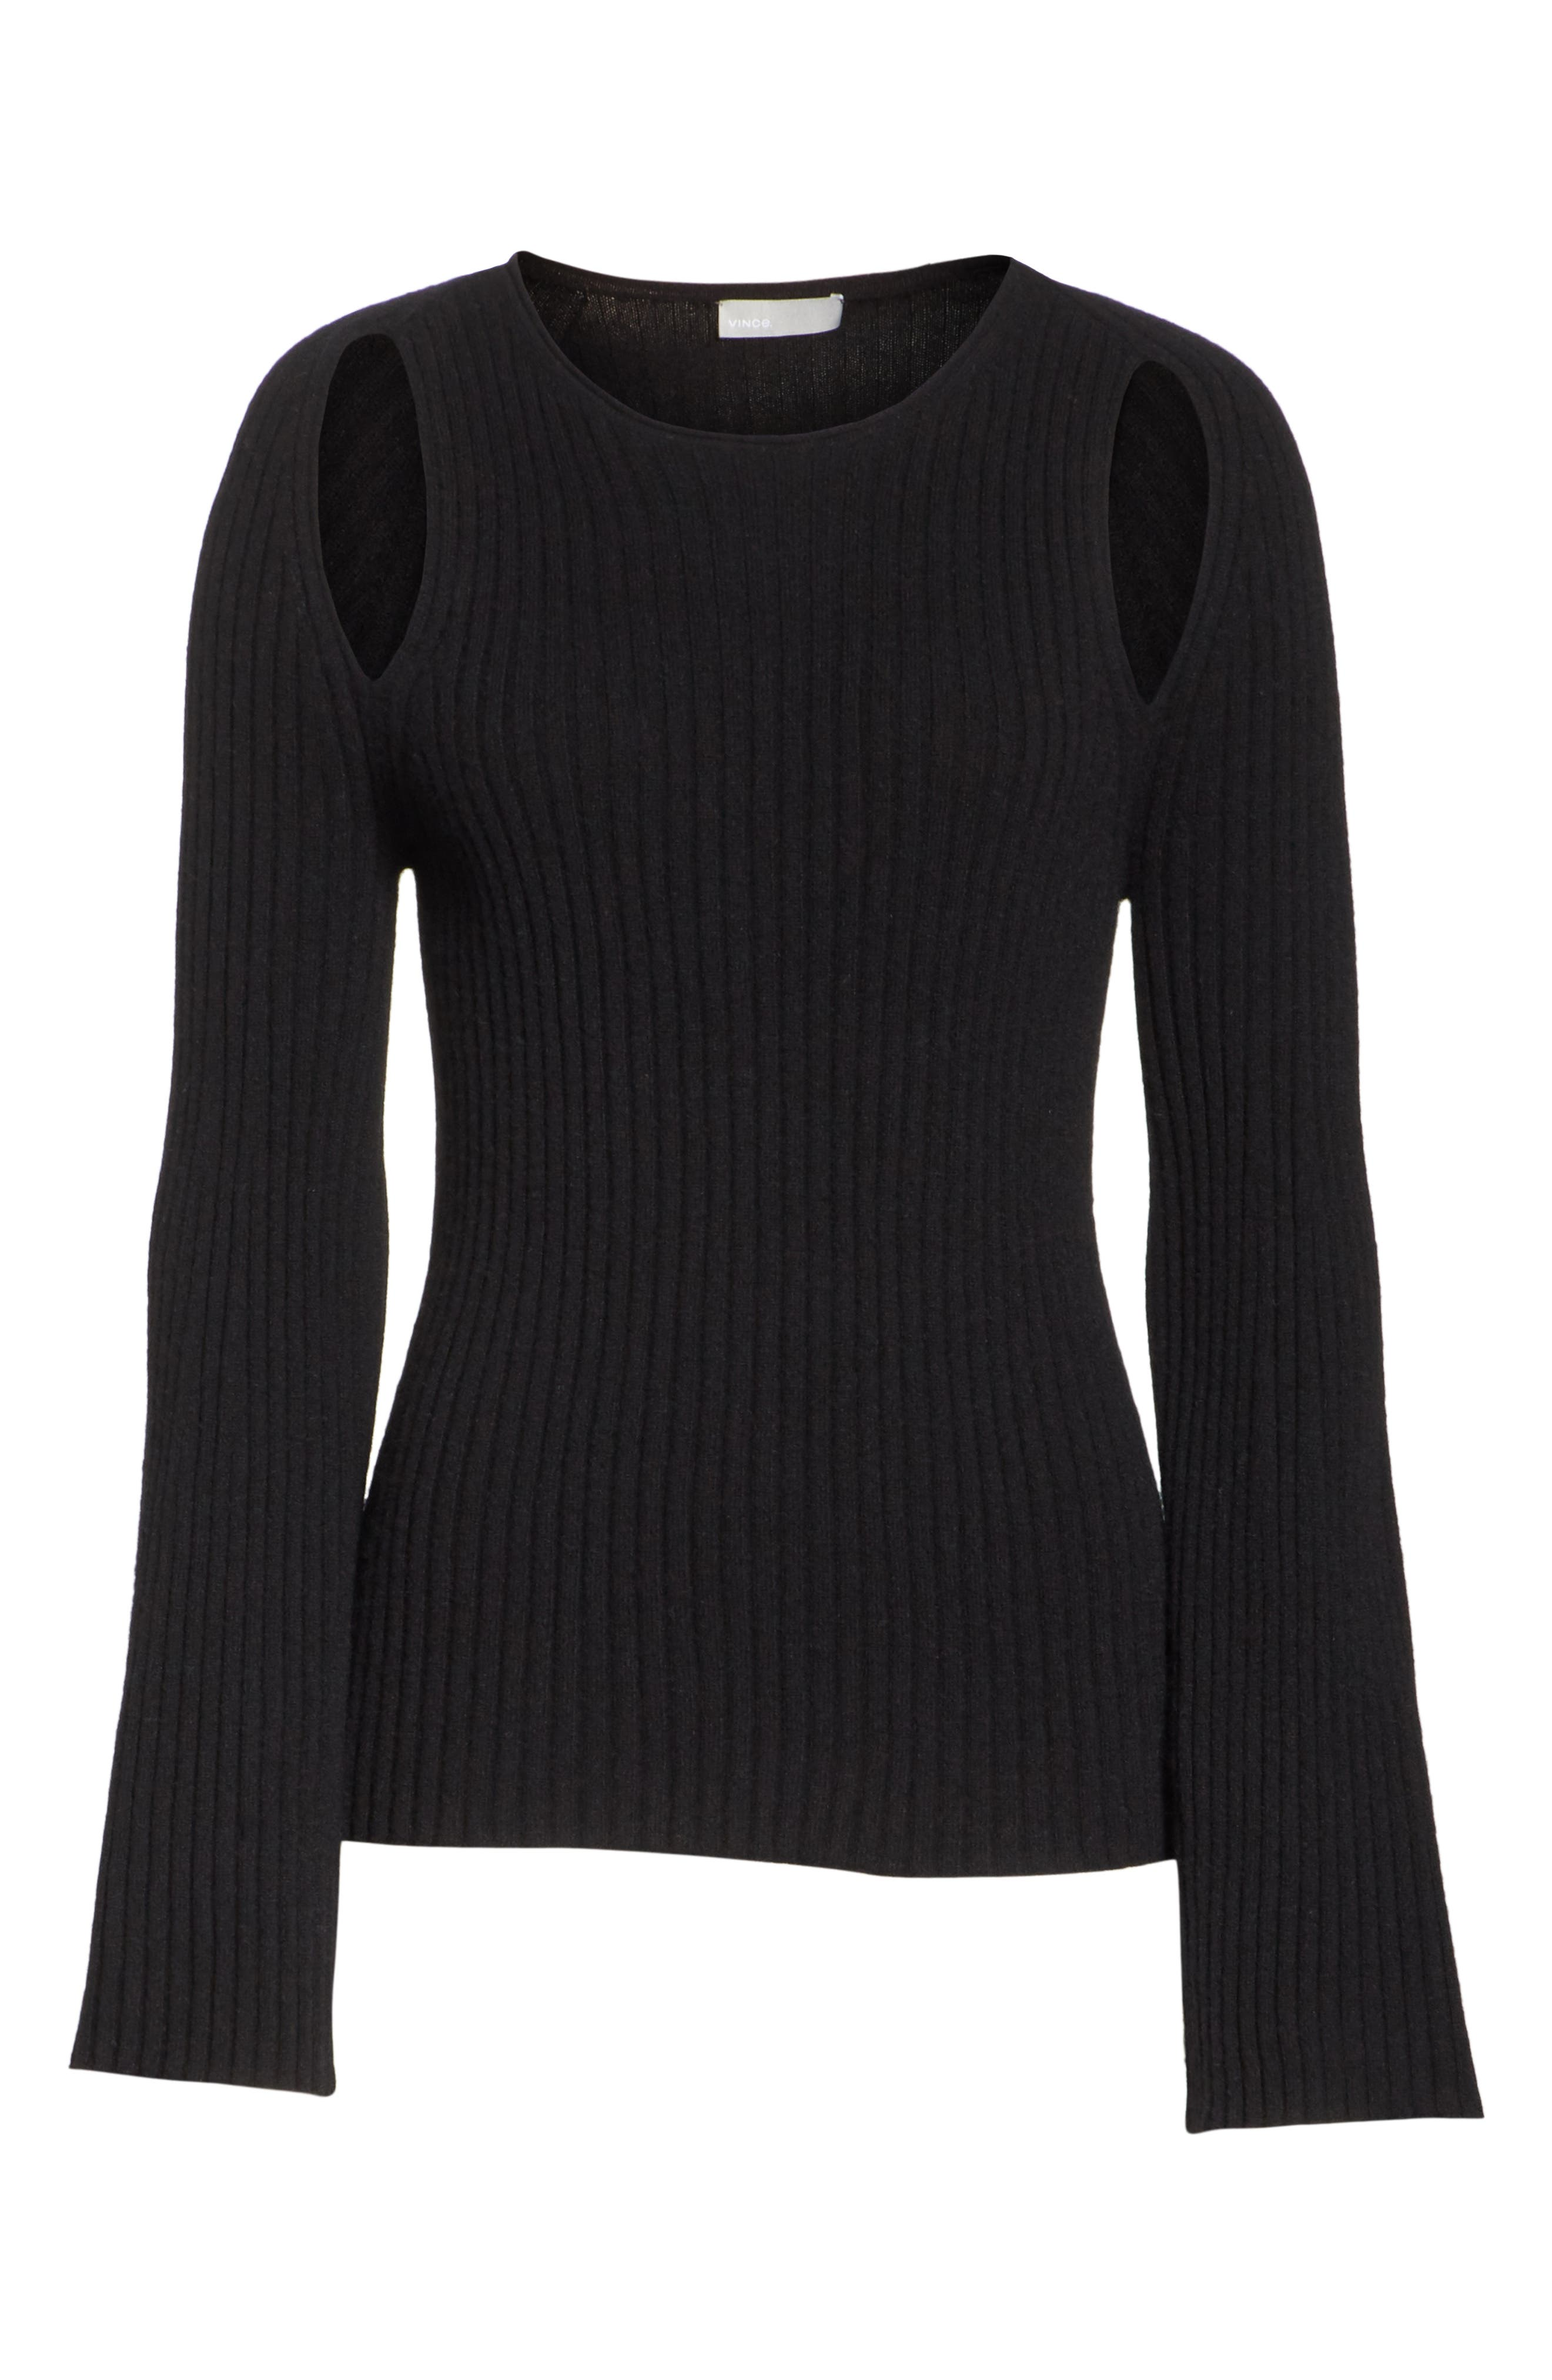 Shoulder Slit Cashmere Crewneck Sweater,                             Alternate thumbnail 6, color,                             BLACK